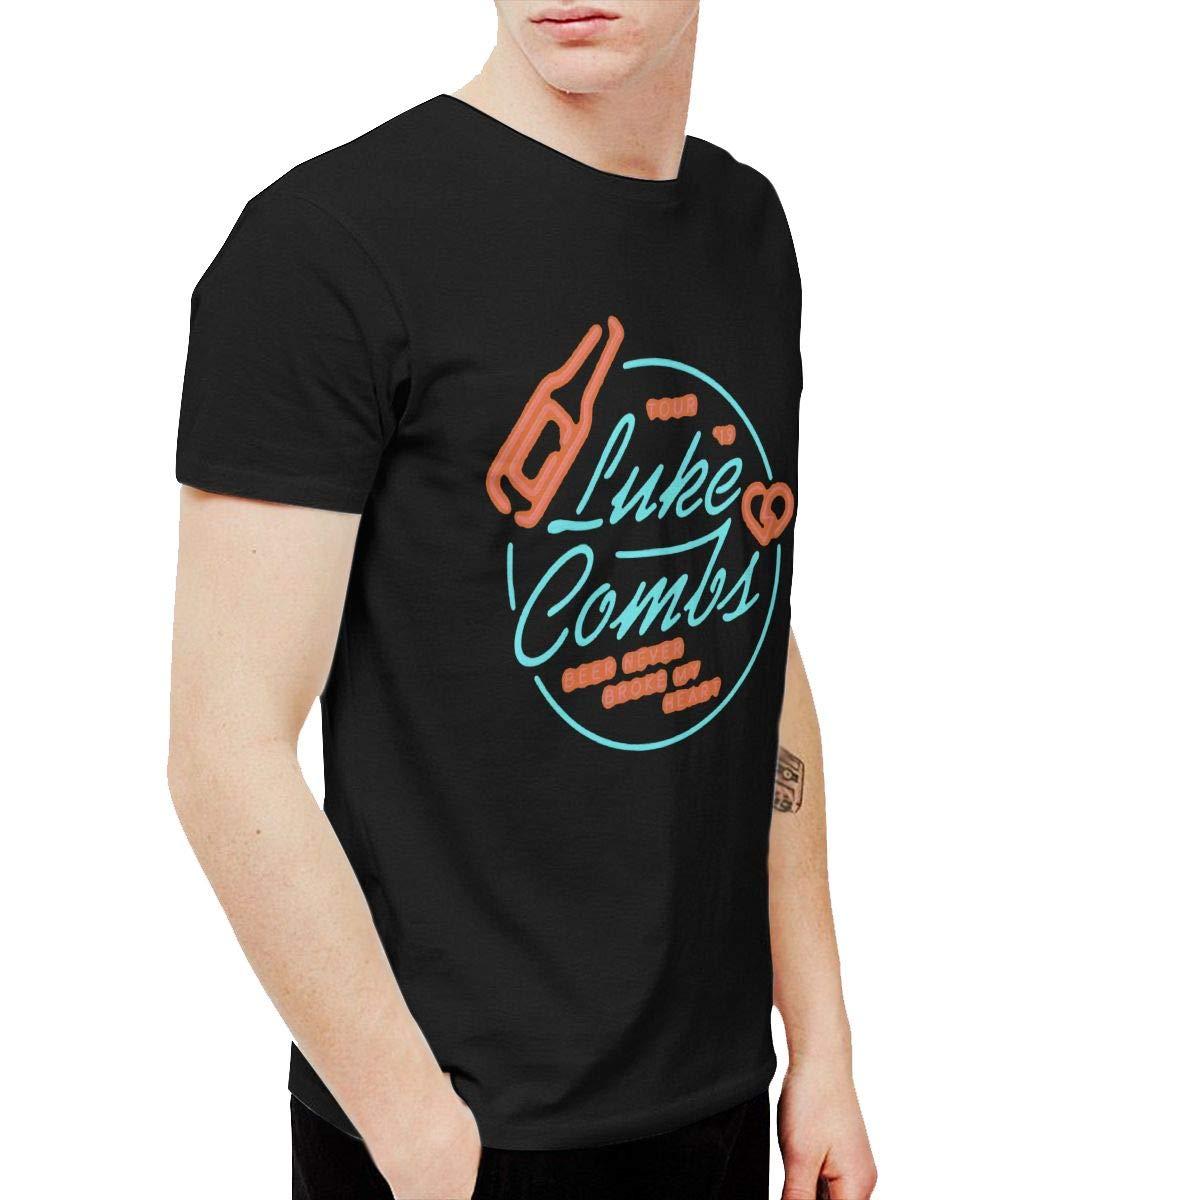 Urahara Luke Combs Beer Never Broke My Heart Tour 19 Unisex Short Sleeved Funny Fashion Art Tshirt Black